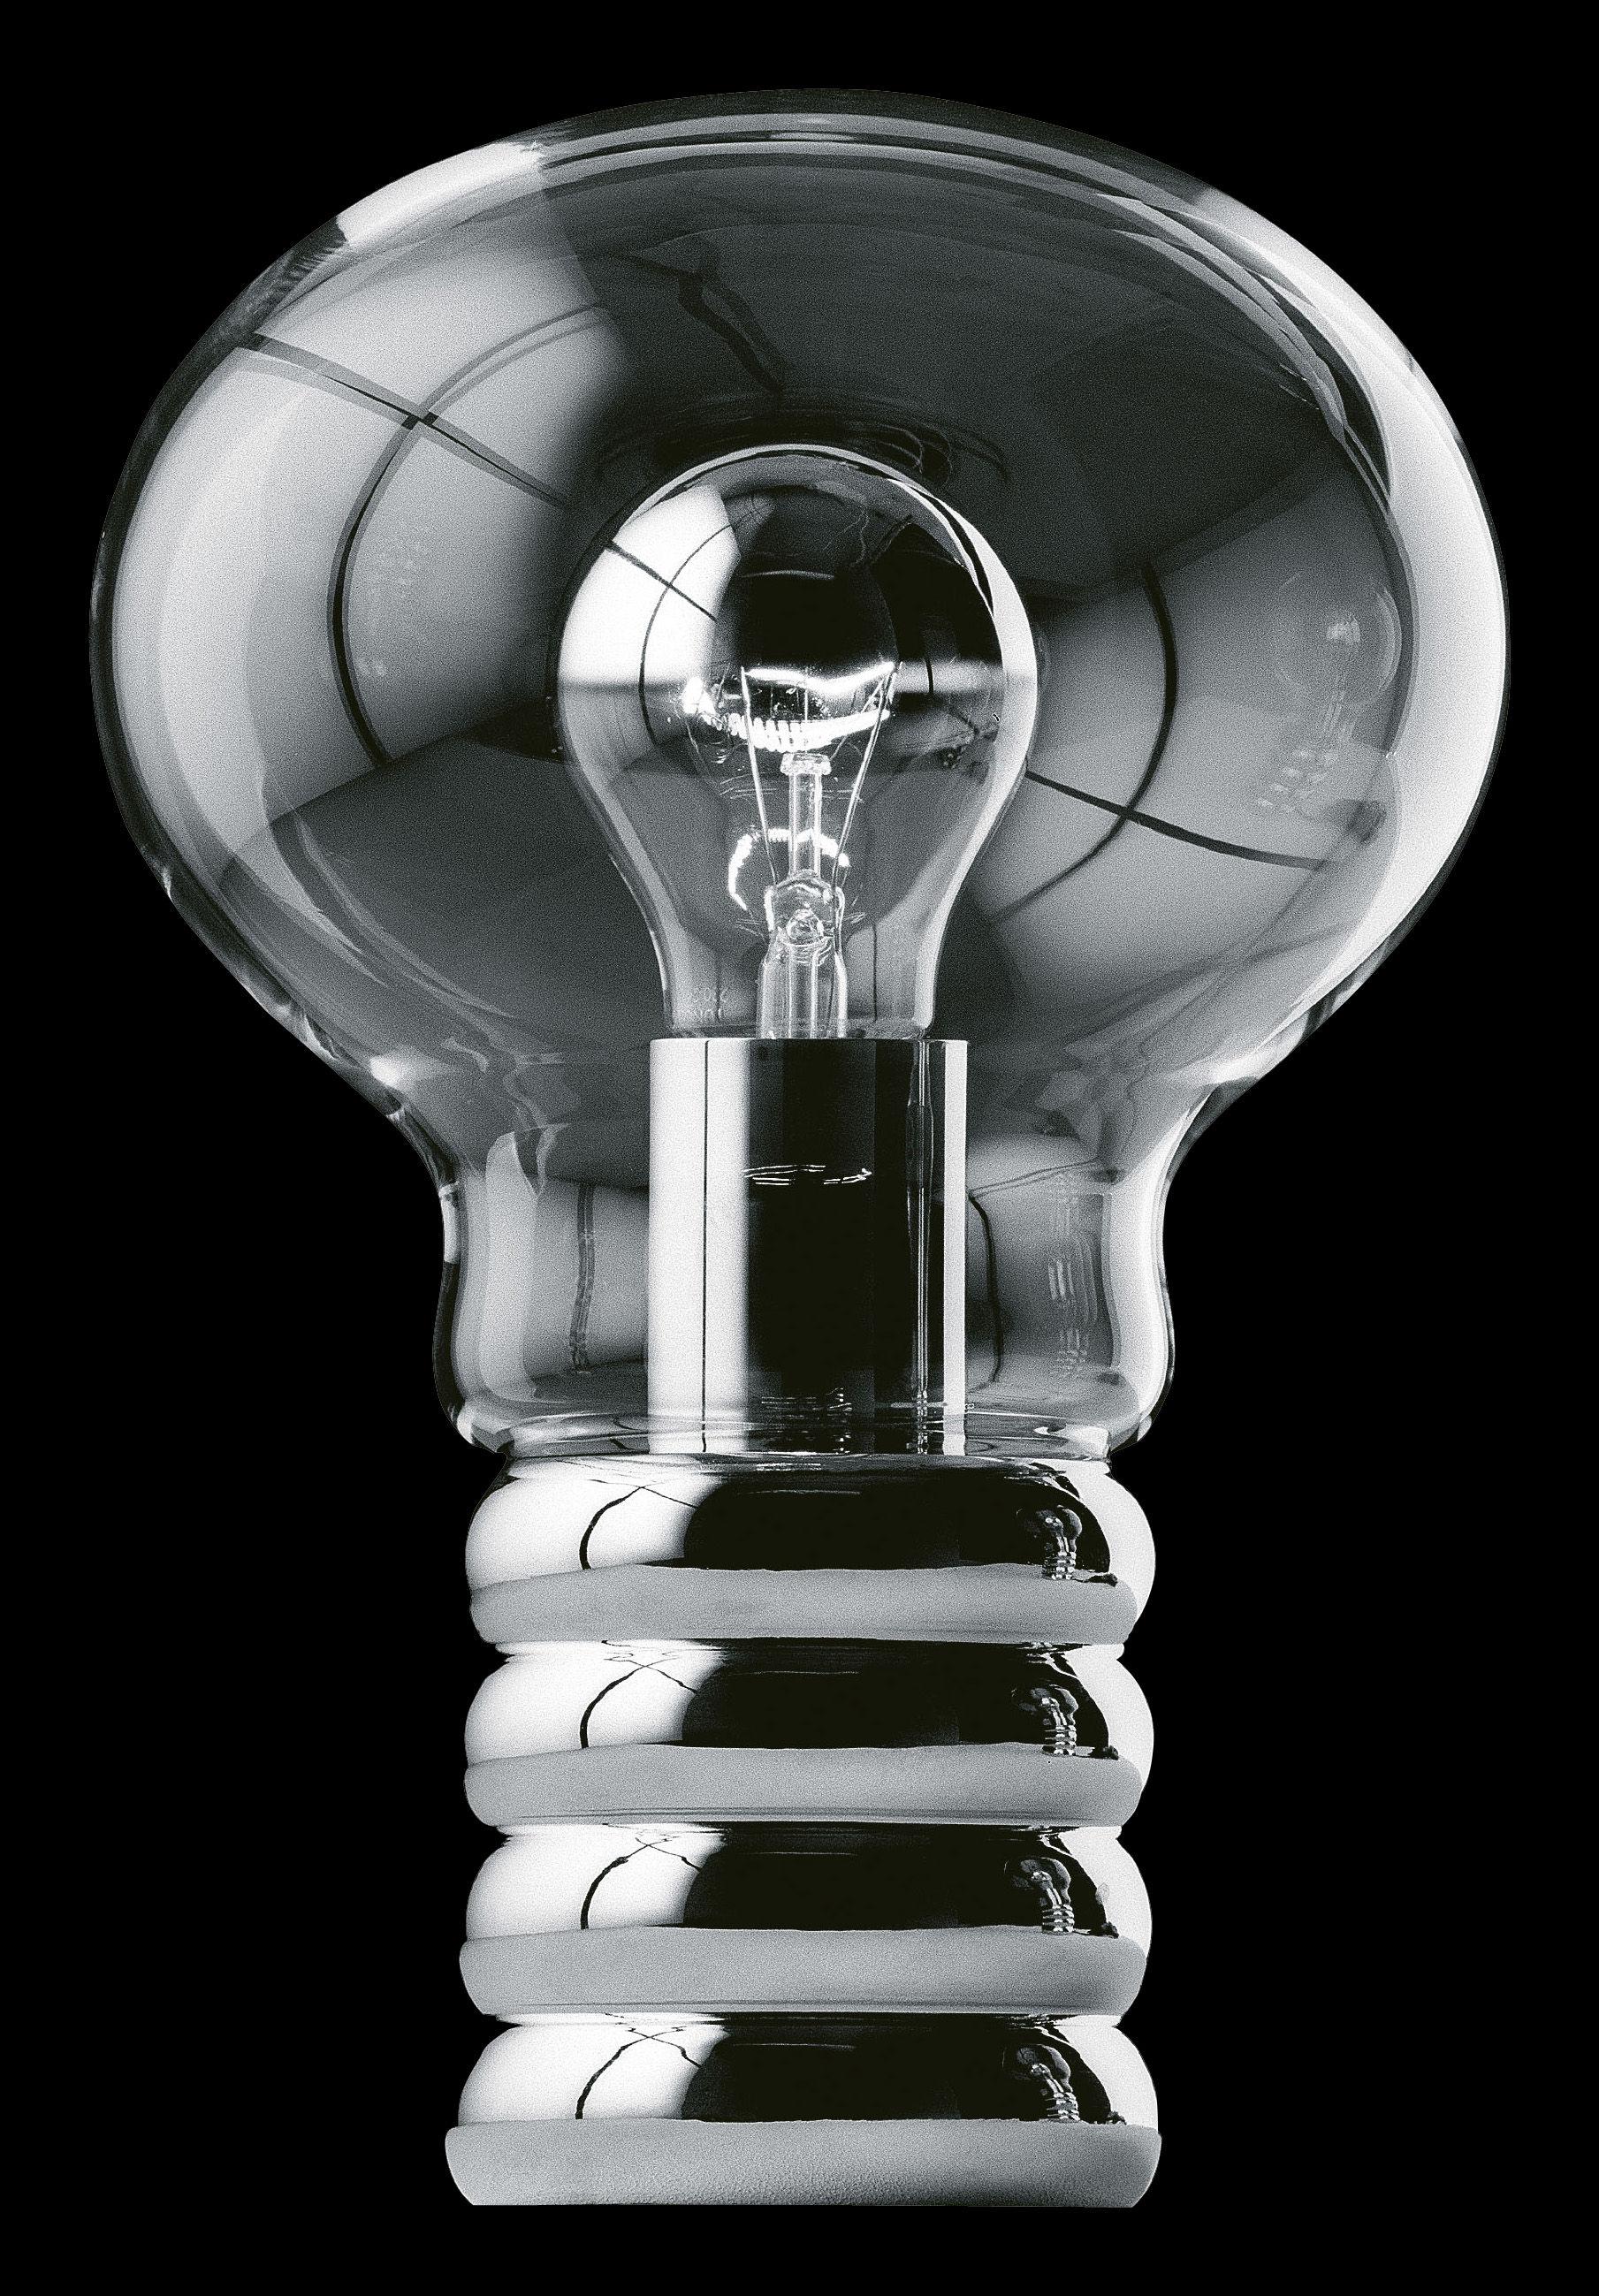 bulb table lamp chromium by ingo maurer. Black Bedroom Furniture Sets. Home Design Ideas